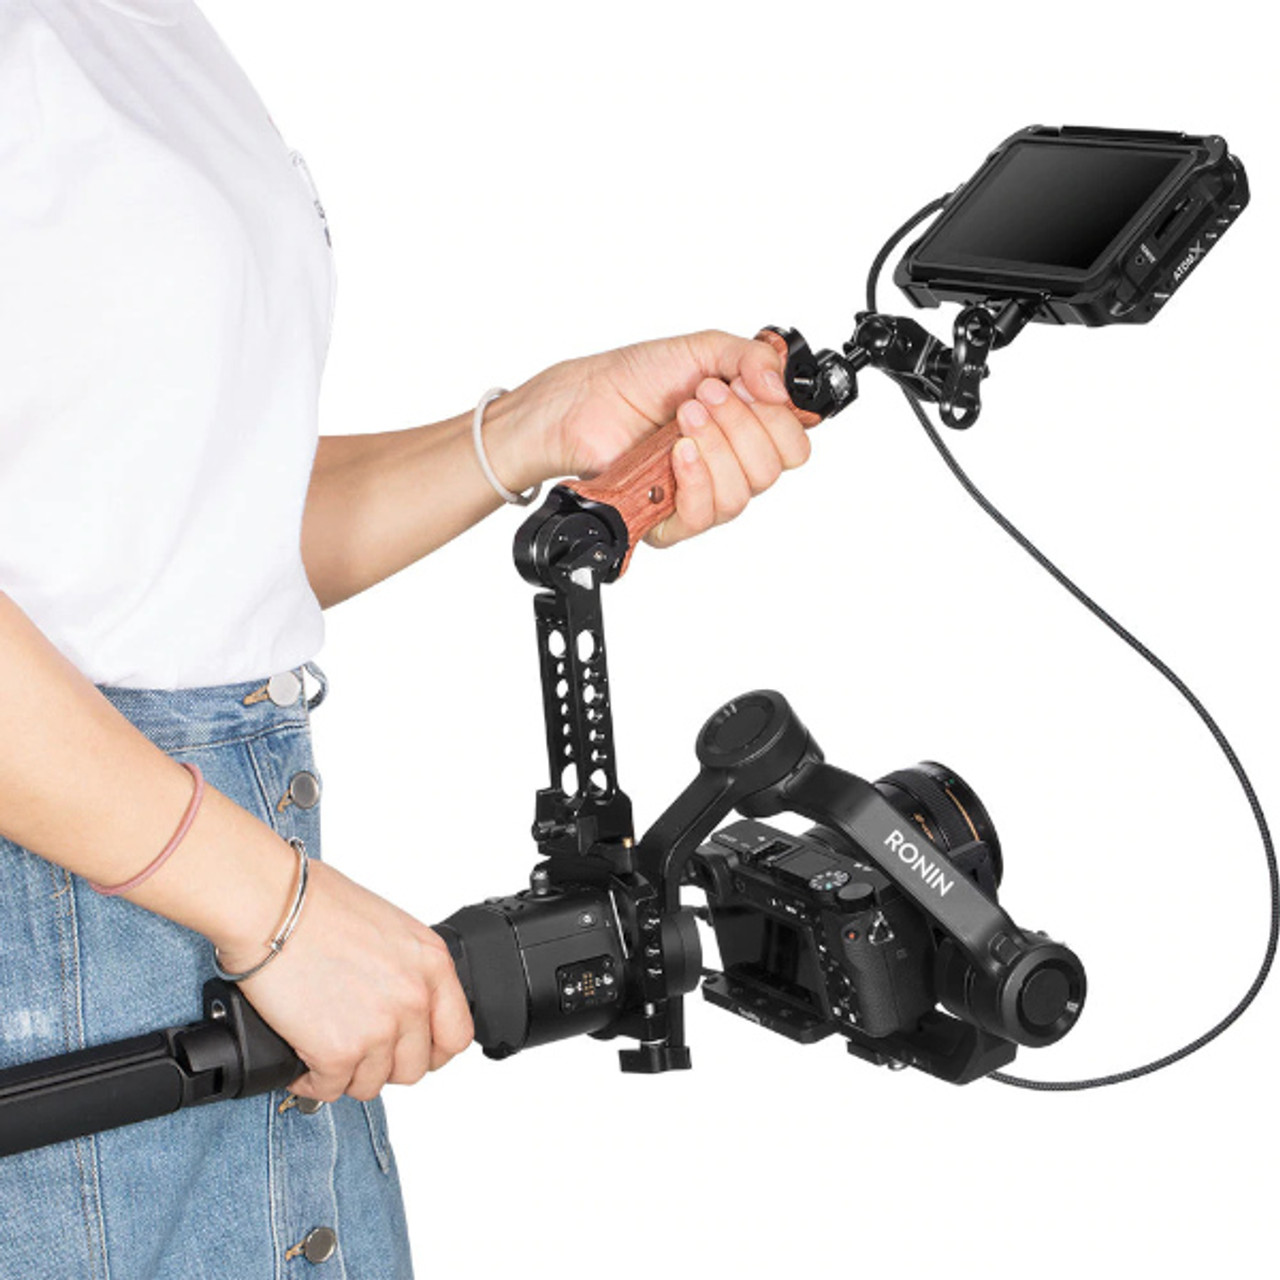 SmallRig Mounting Clamp for DJI Ronin-SC Gimbal